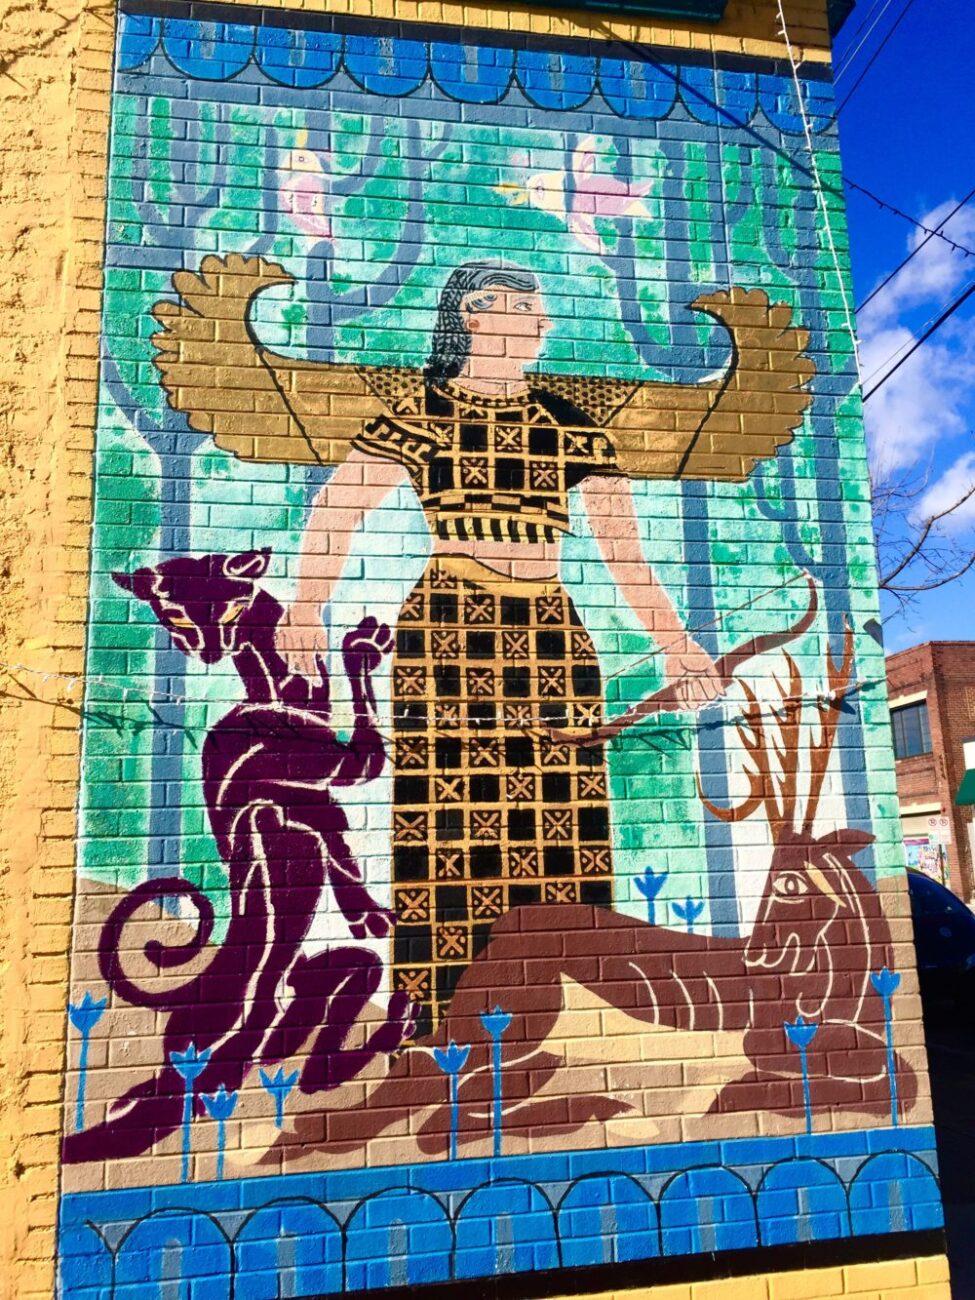 RVA Mural Project Street Art| Packs Light